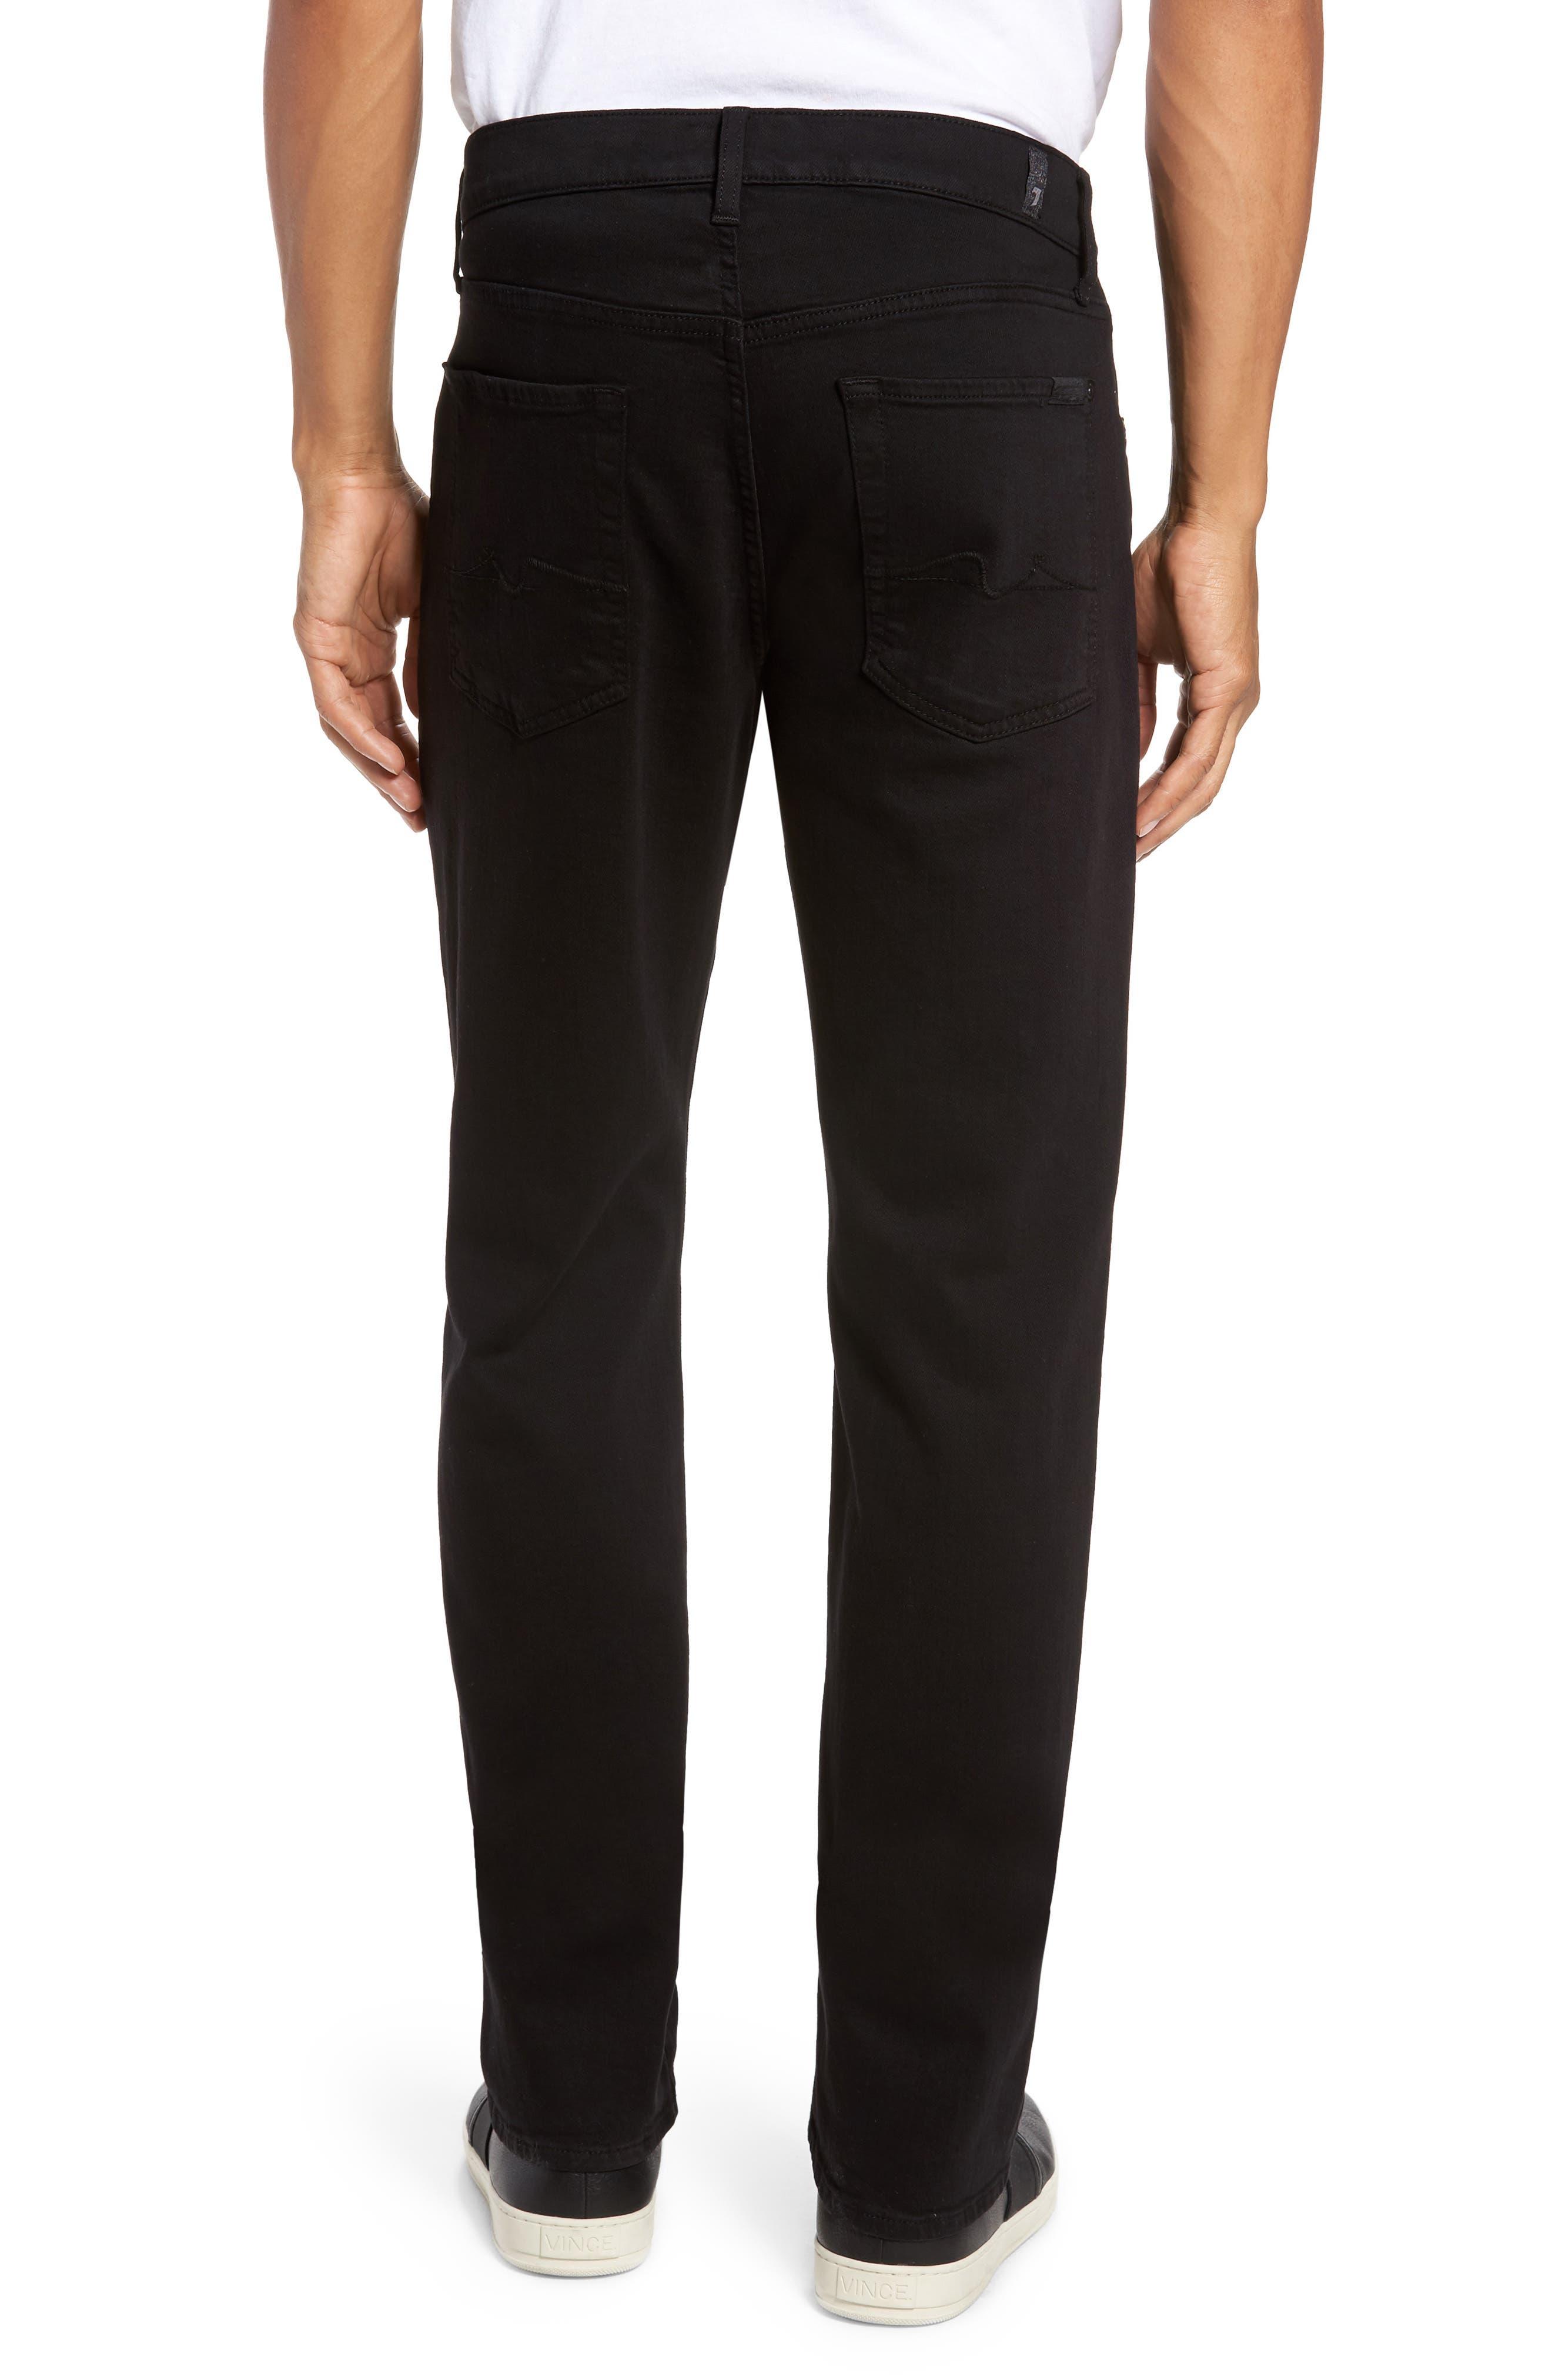 Luxe Performance - Slimmy Slim Fit Jeans,                             Alternate thumbnail 2, color,                             ANNEX BLACK